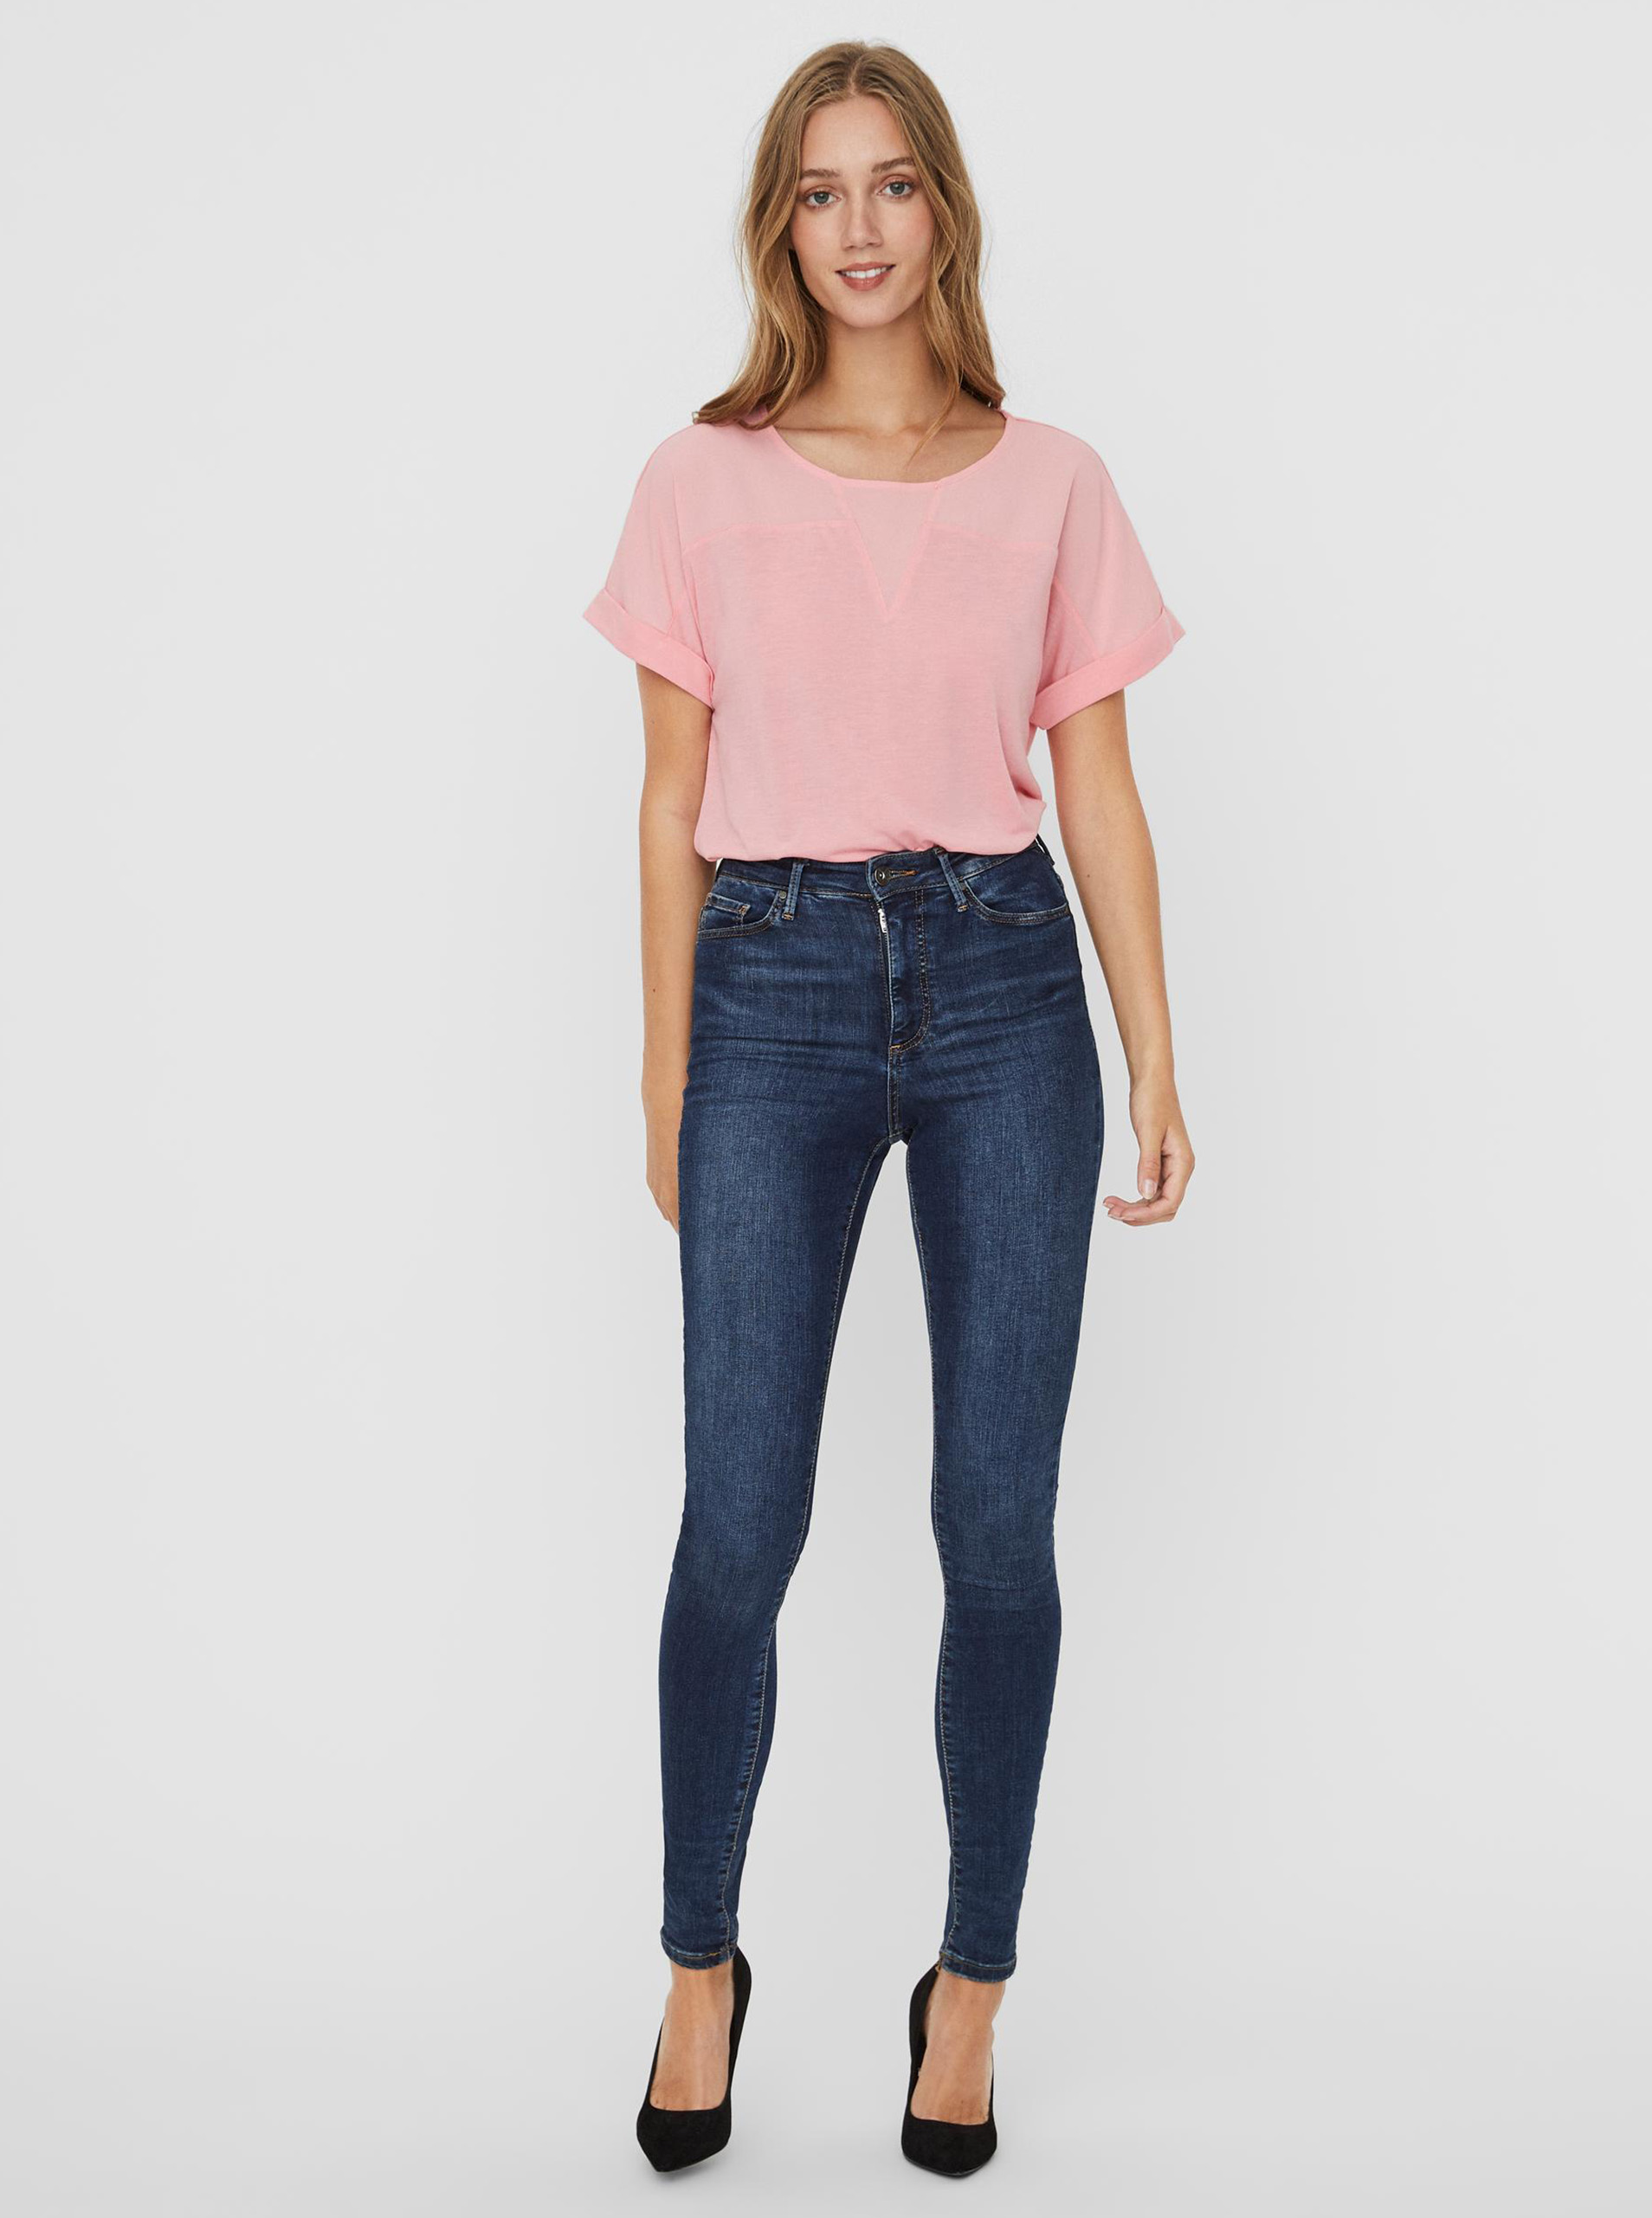 Vero Moda różowy bluzka Ellen